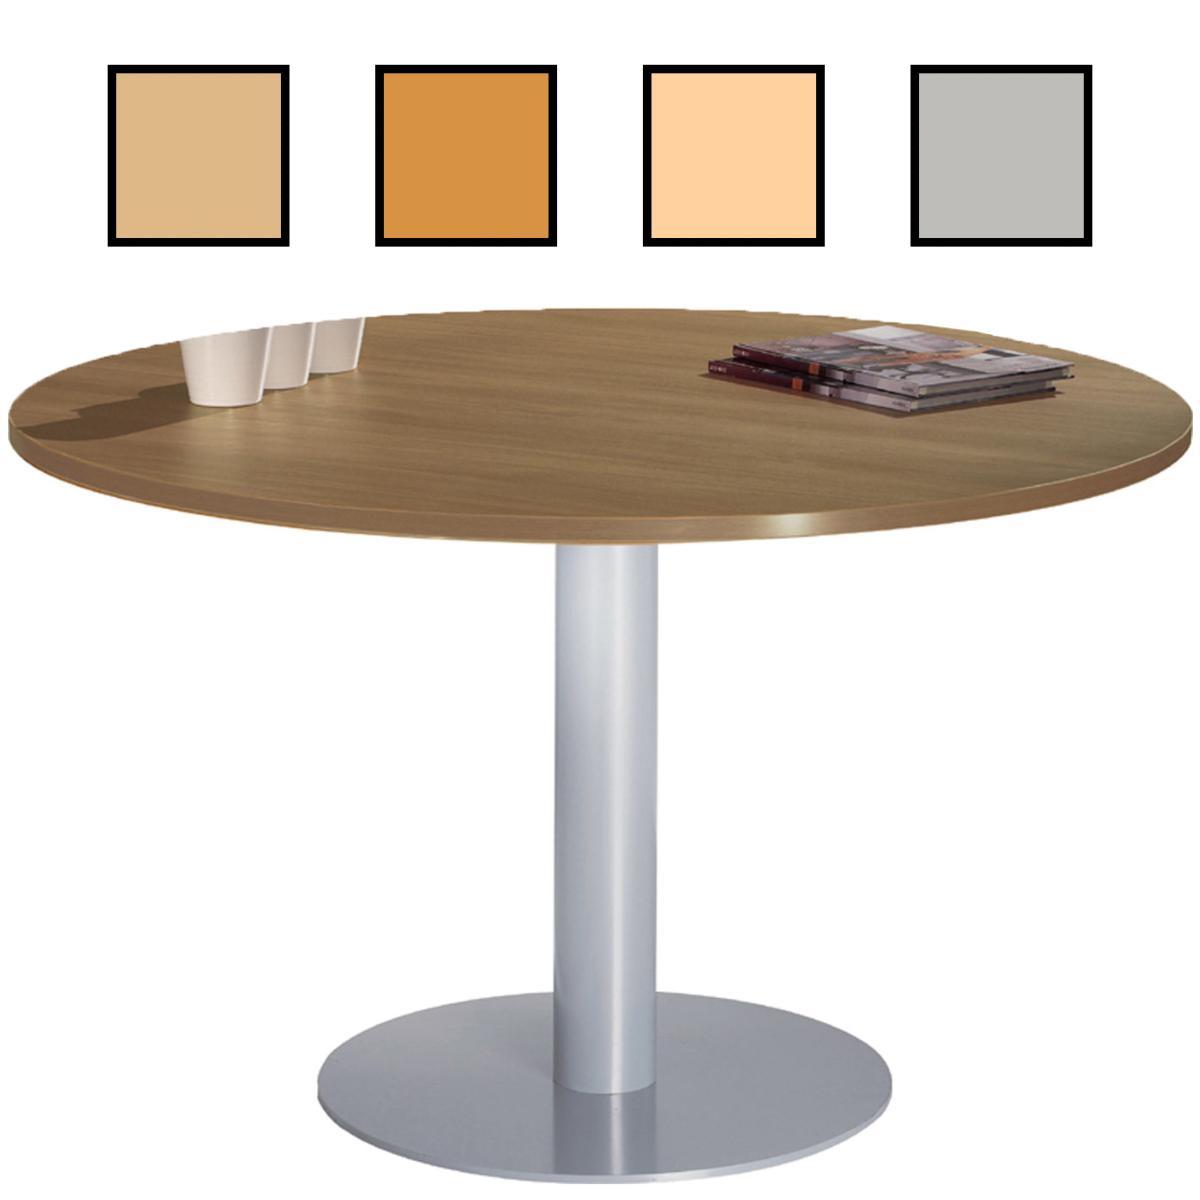 vantaa table modulaire ronde rectangulaire